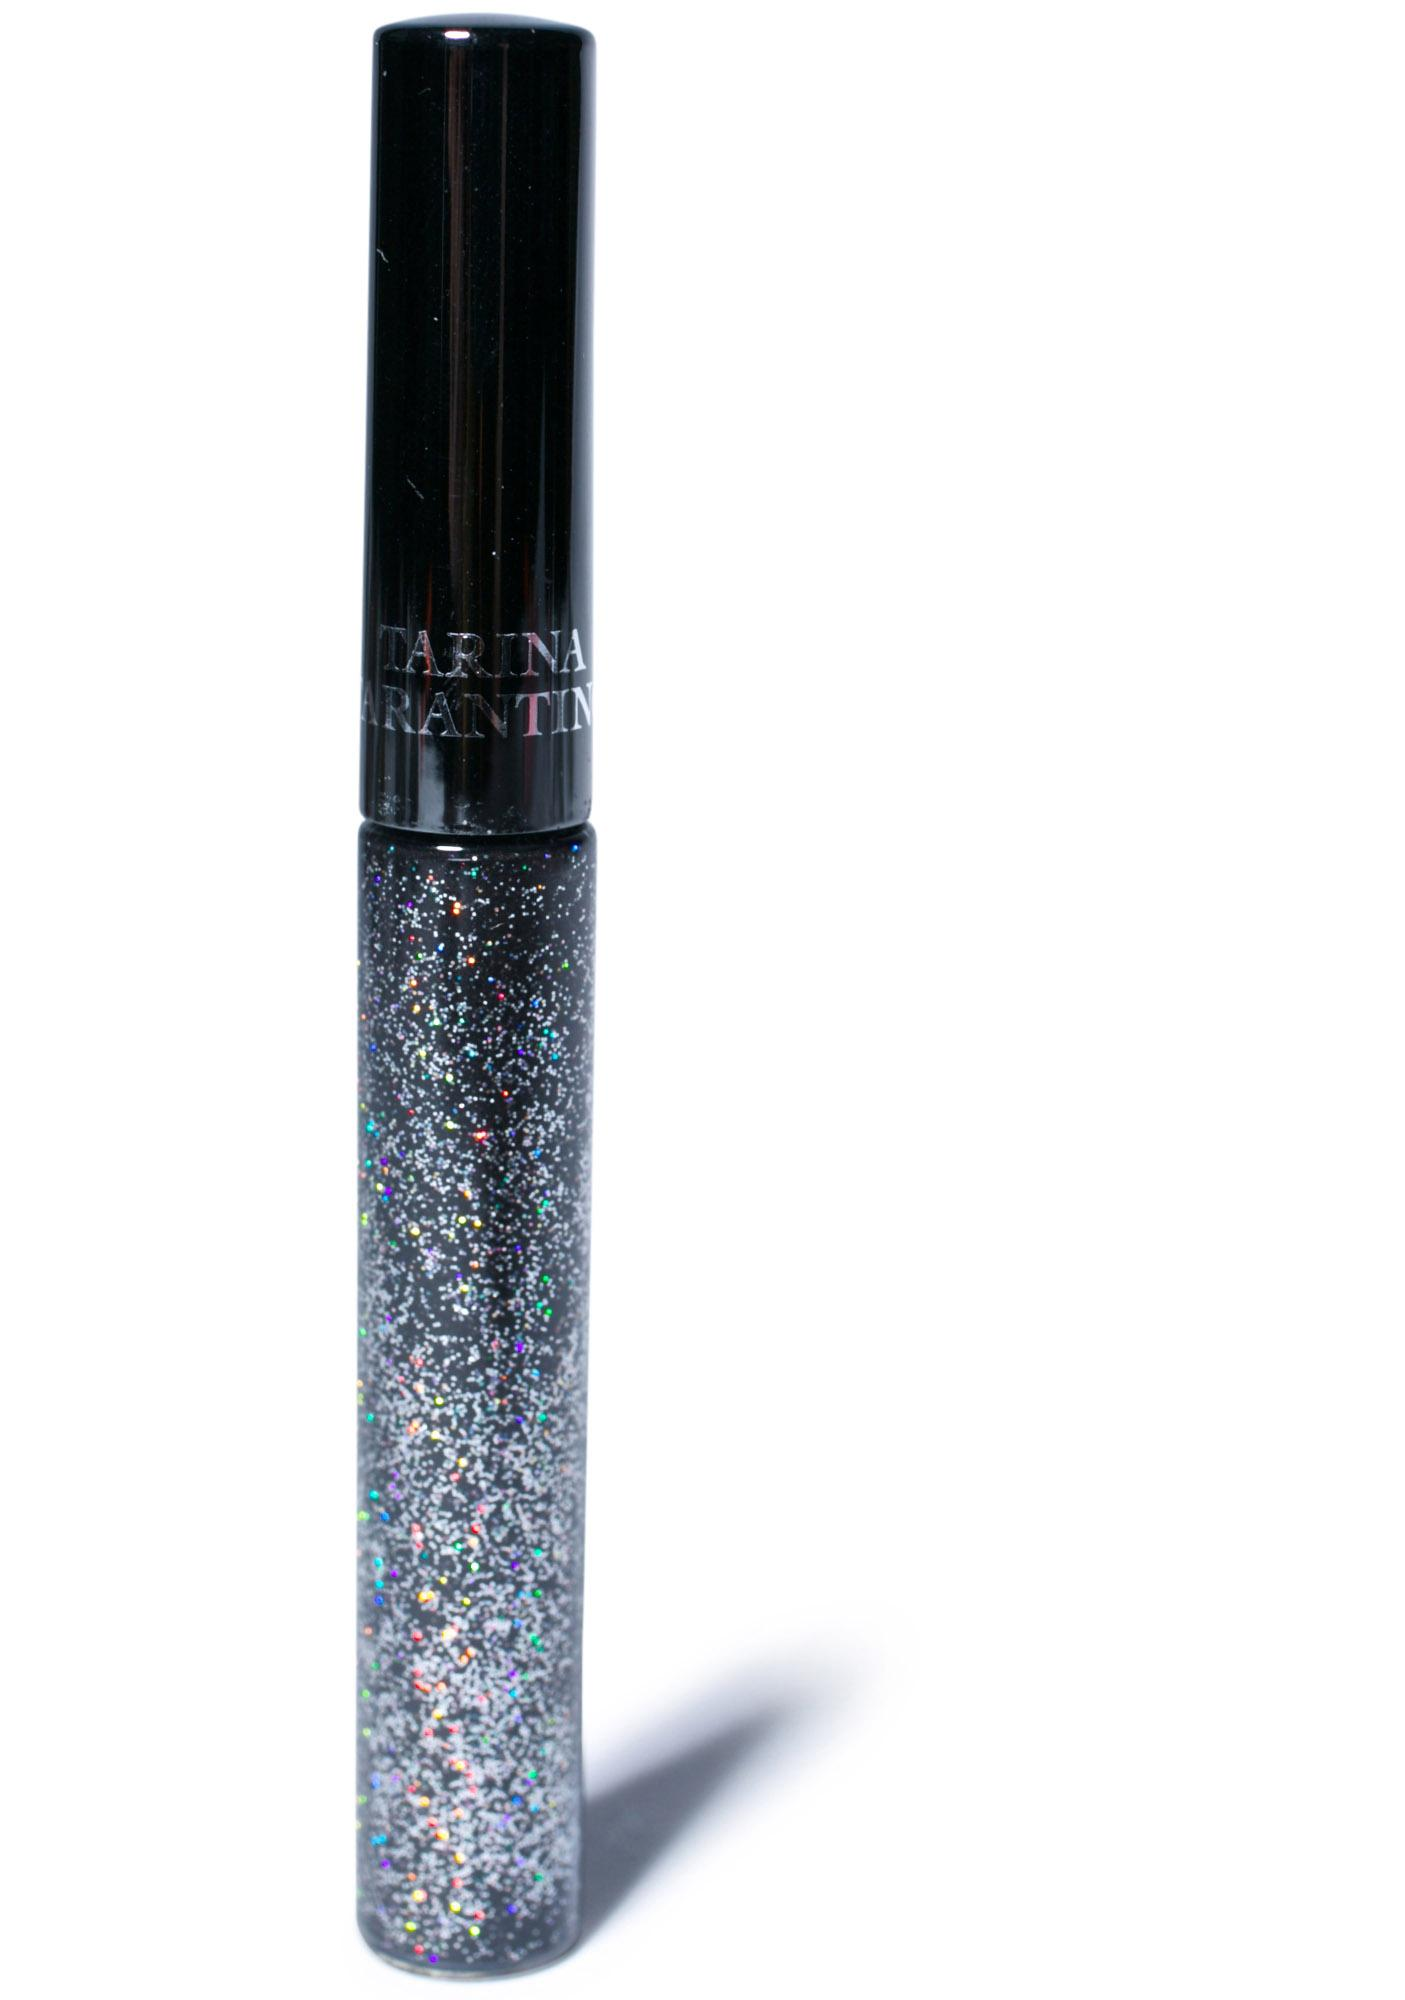 Tarina Tarantino Black Diamond Eyelicity Glitter Liner